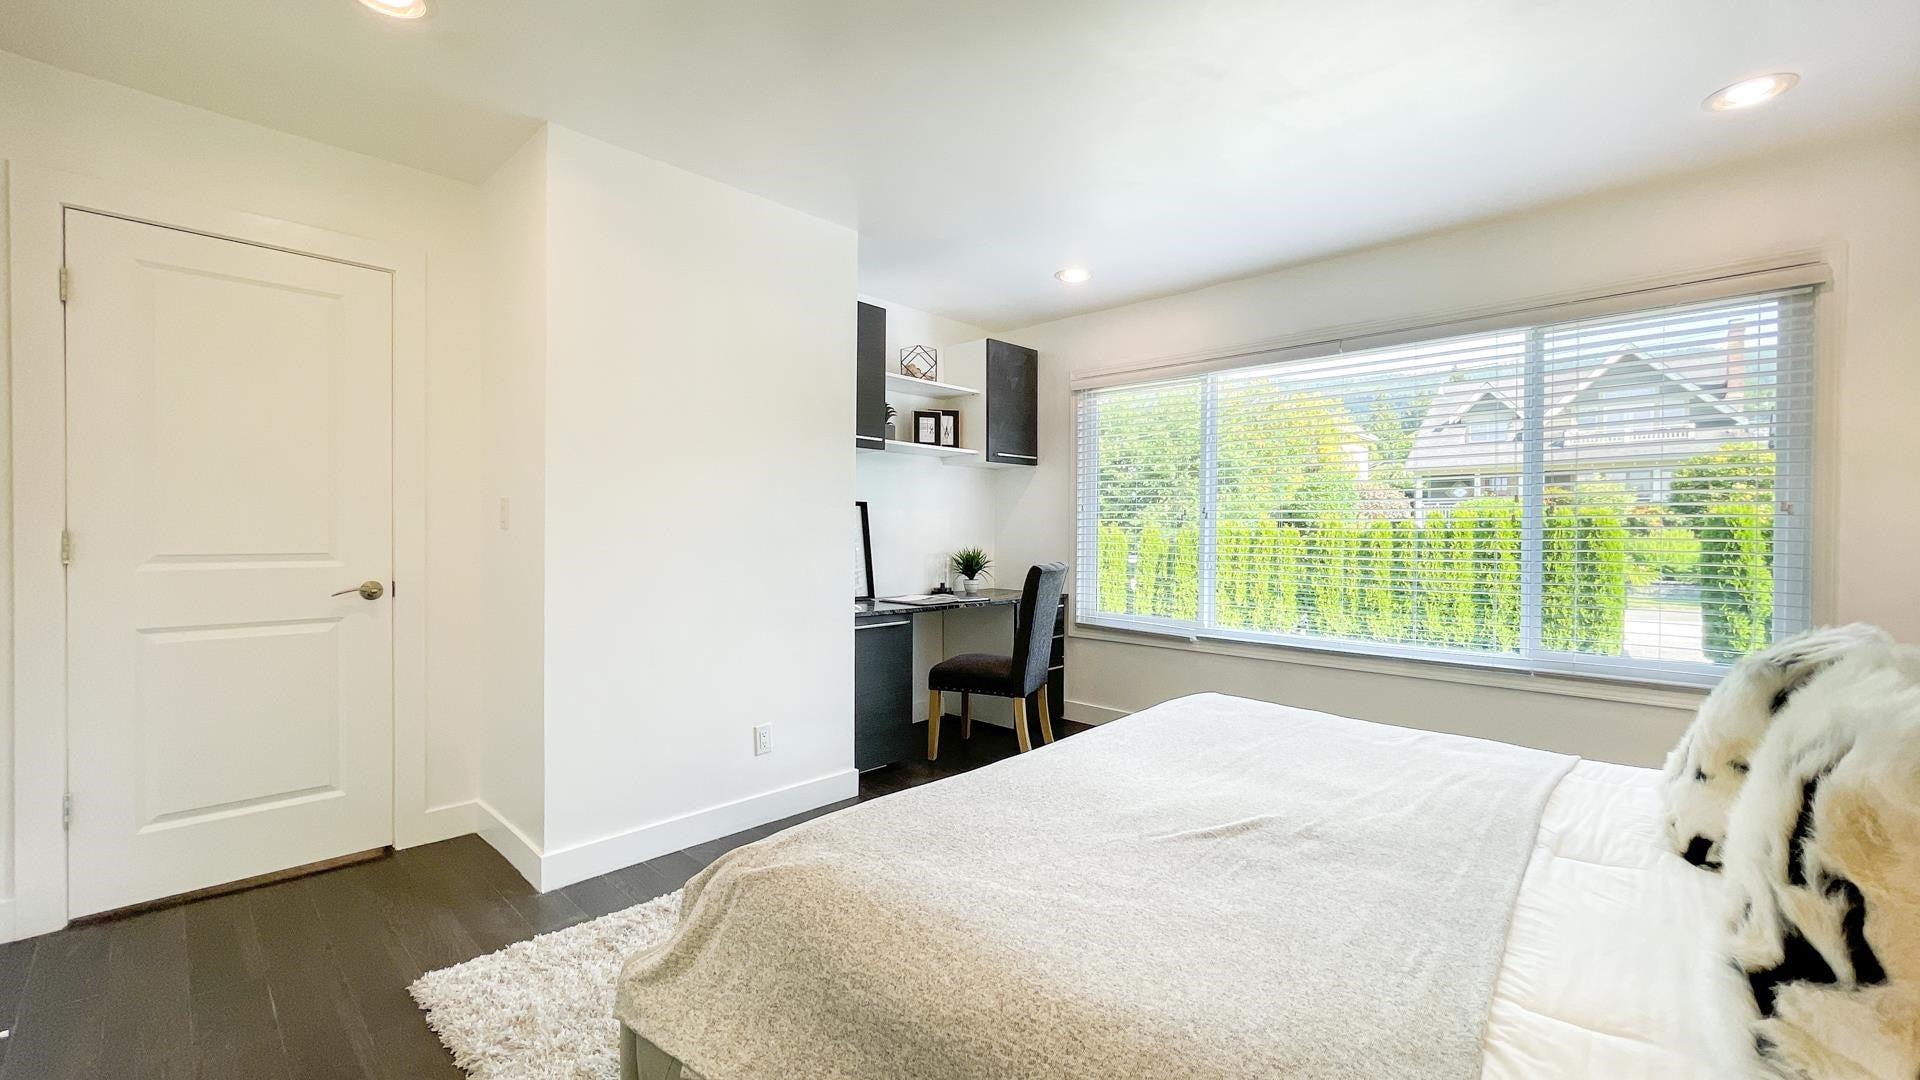 1168 JEFFERSON AVENUE - Ambleside House/Single Family for sale, 6 Bedrooms (R2602275) - #11